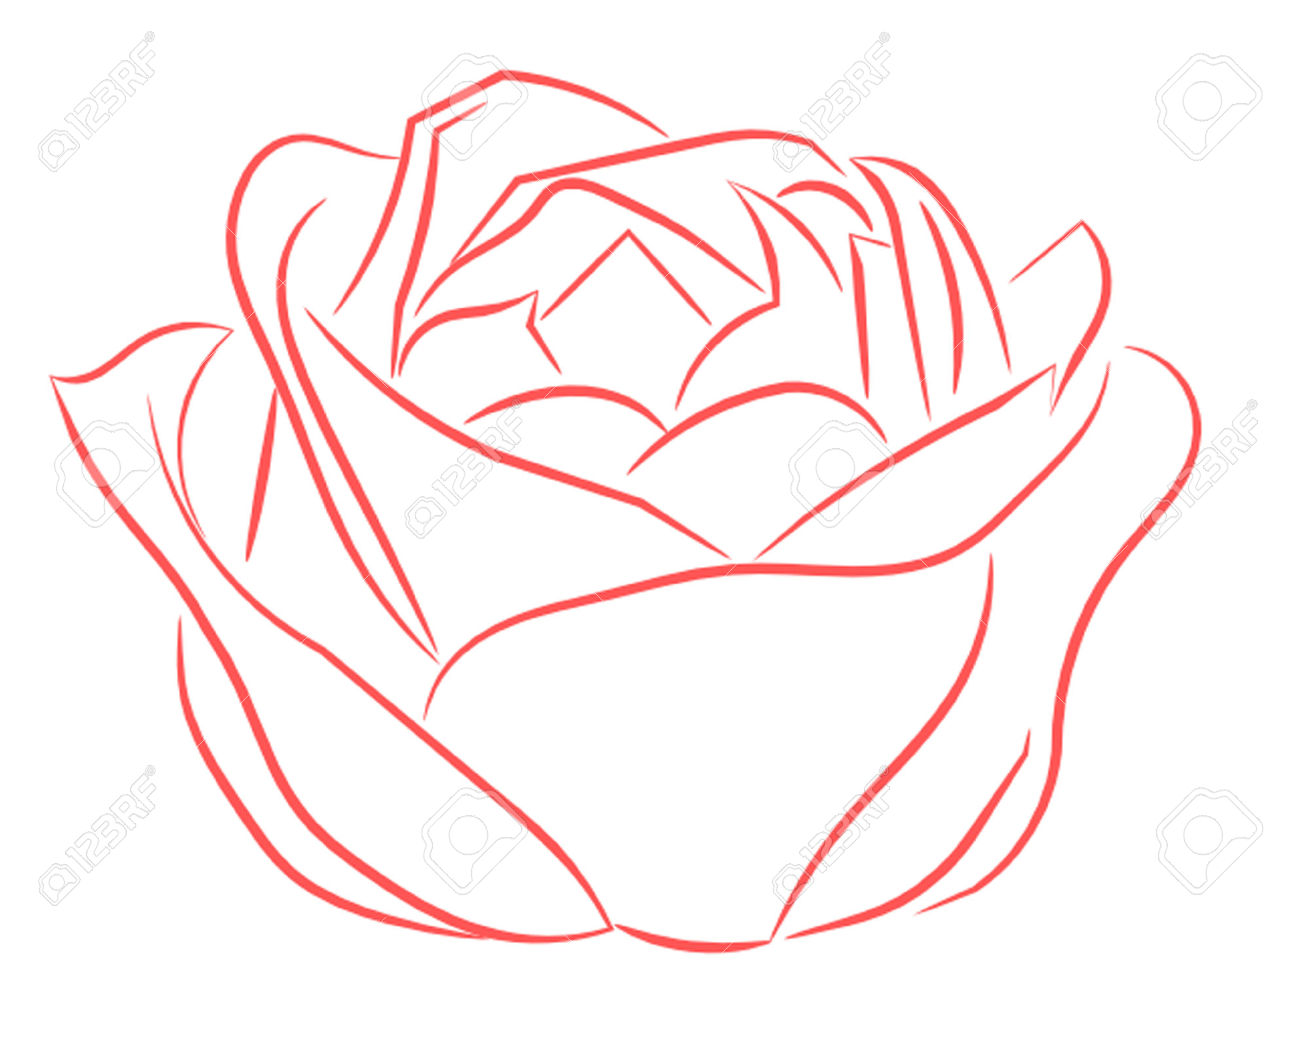 Pink rose outline clipart.